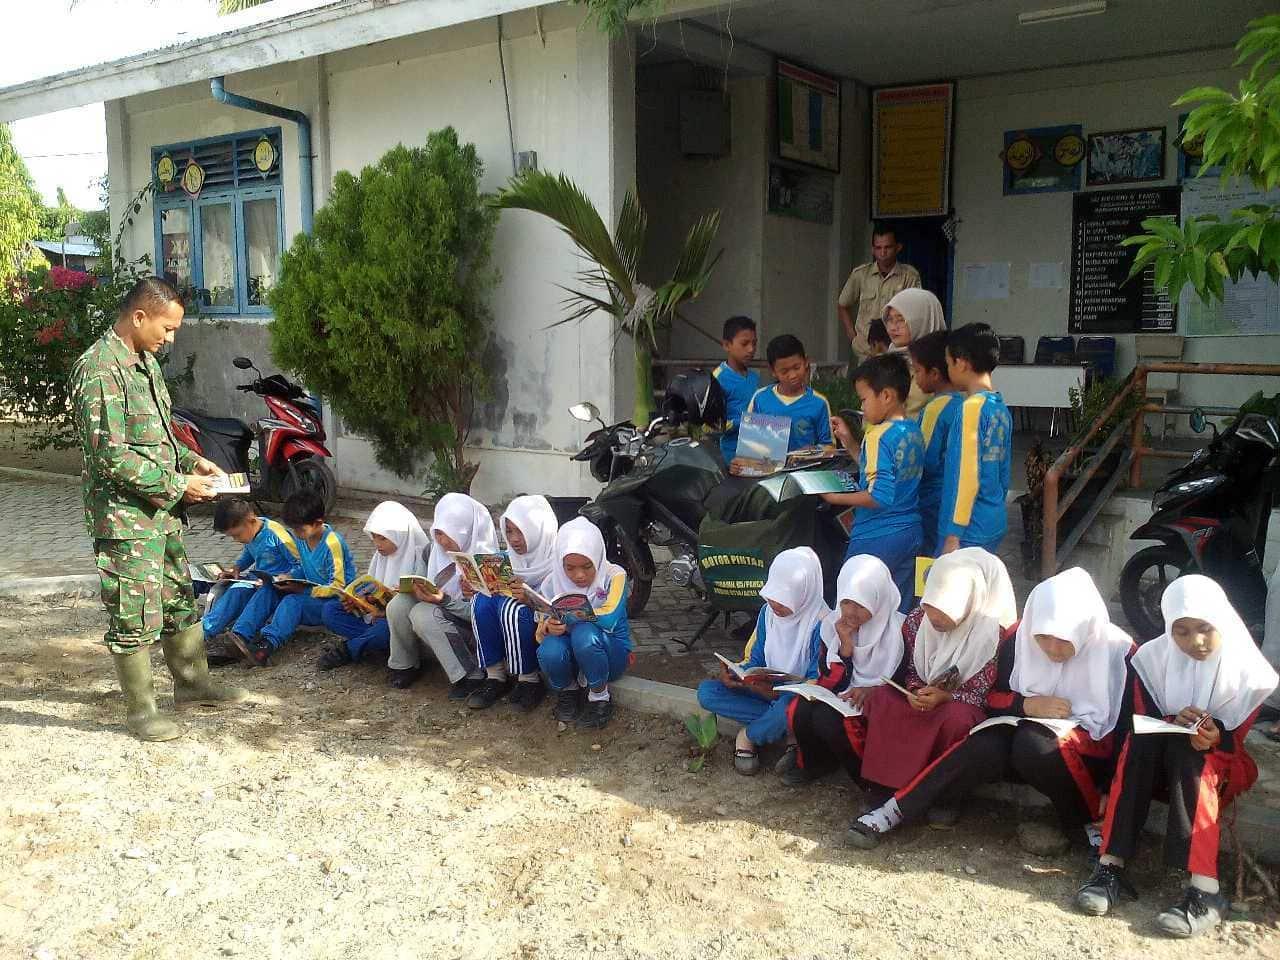 Babinsa Koramil 05 Panga Kodim 0114 Aceh Jaya Serda Faisal mengoptimalkan motor pintar ke SD Negeri 02 Ladang Baro Kec. Panga Kab. Aceh Jaya